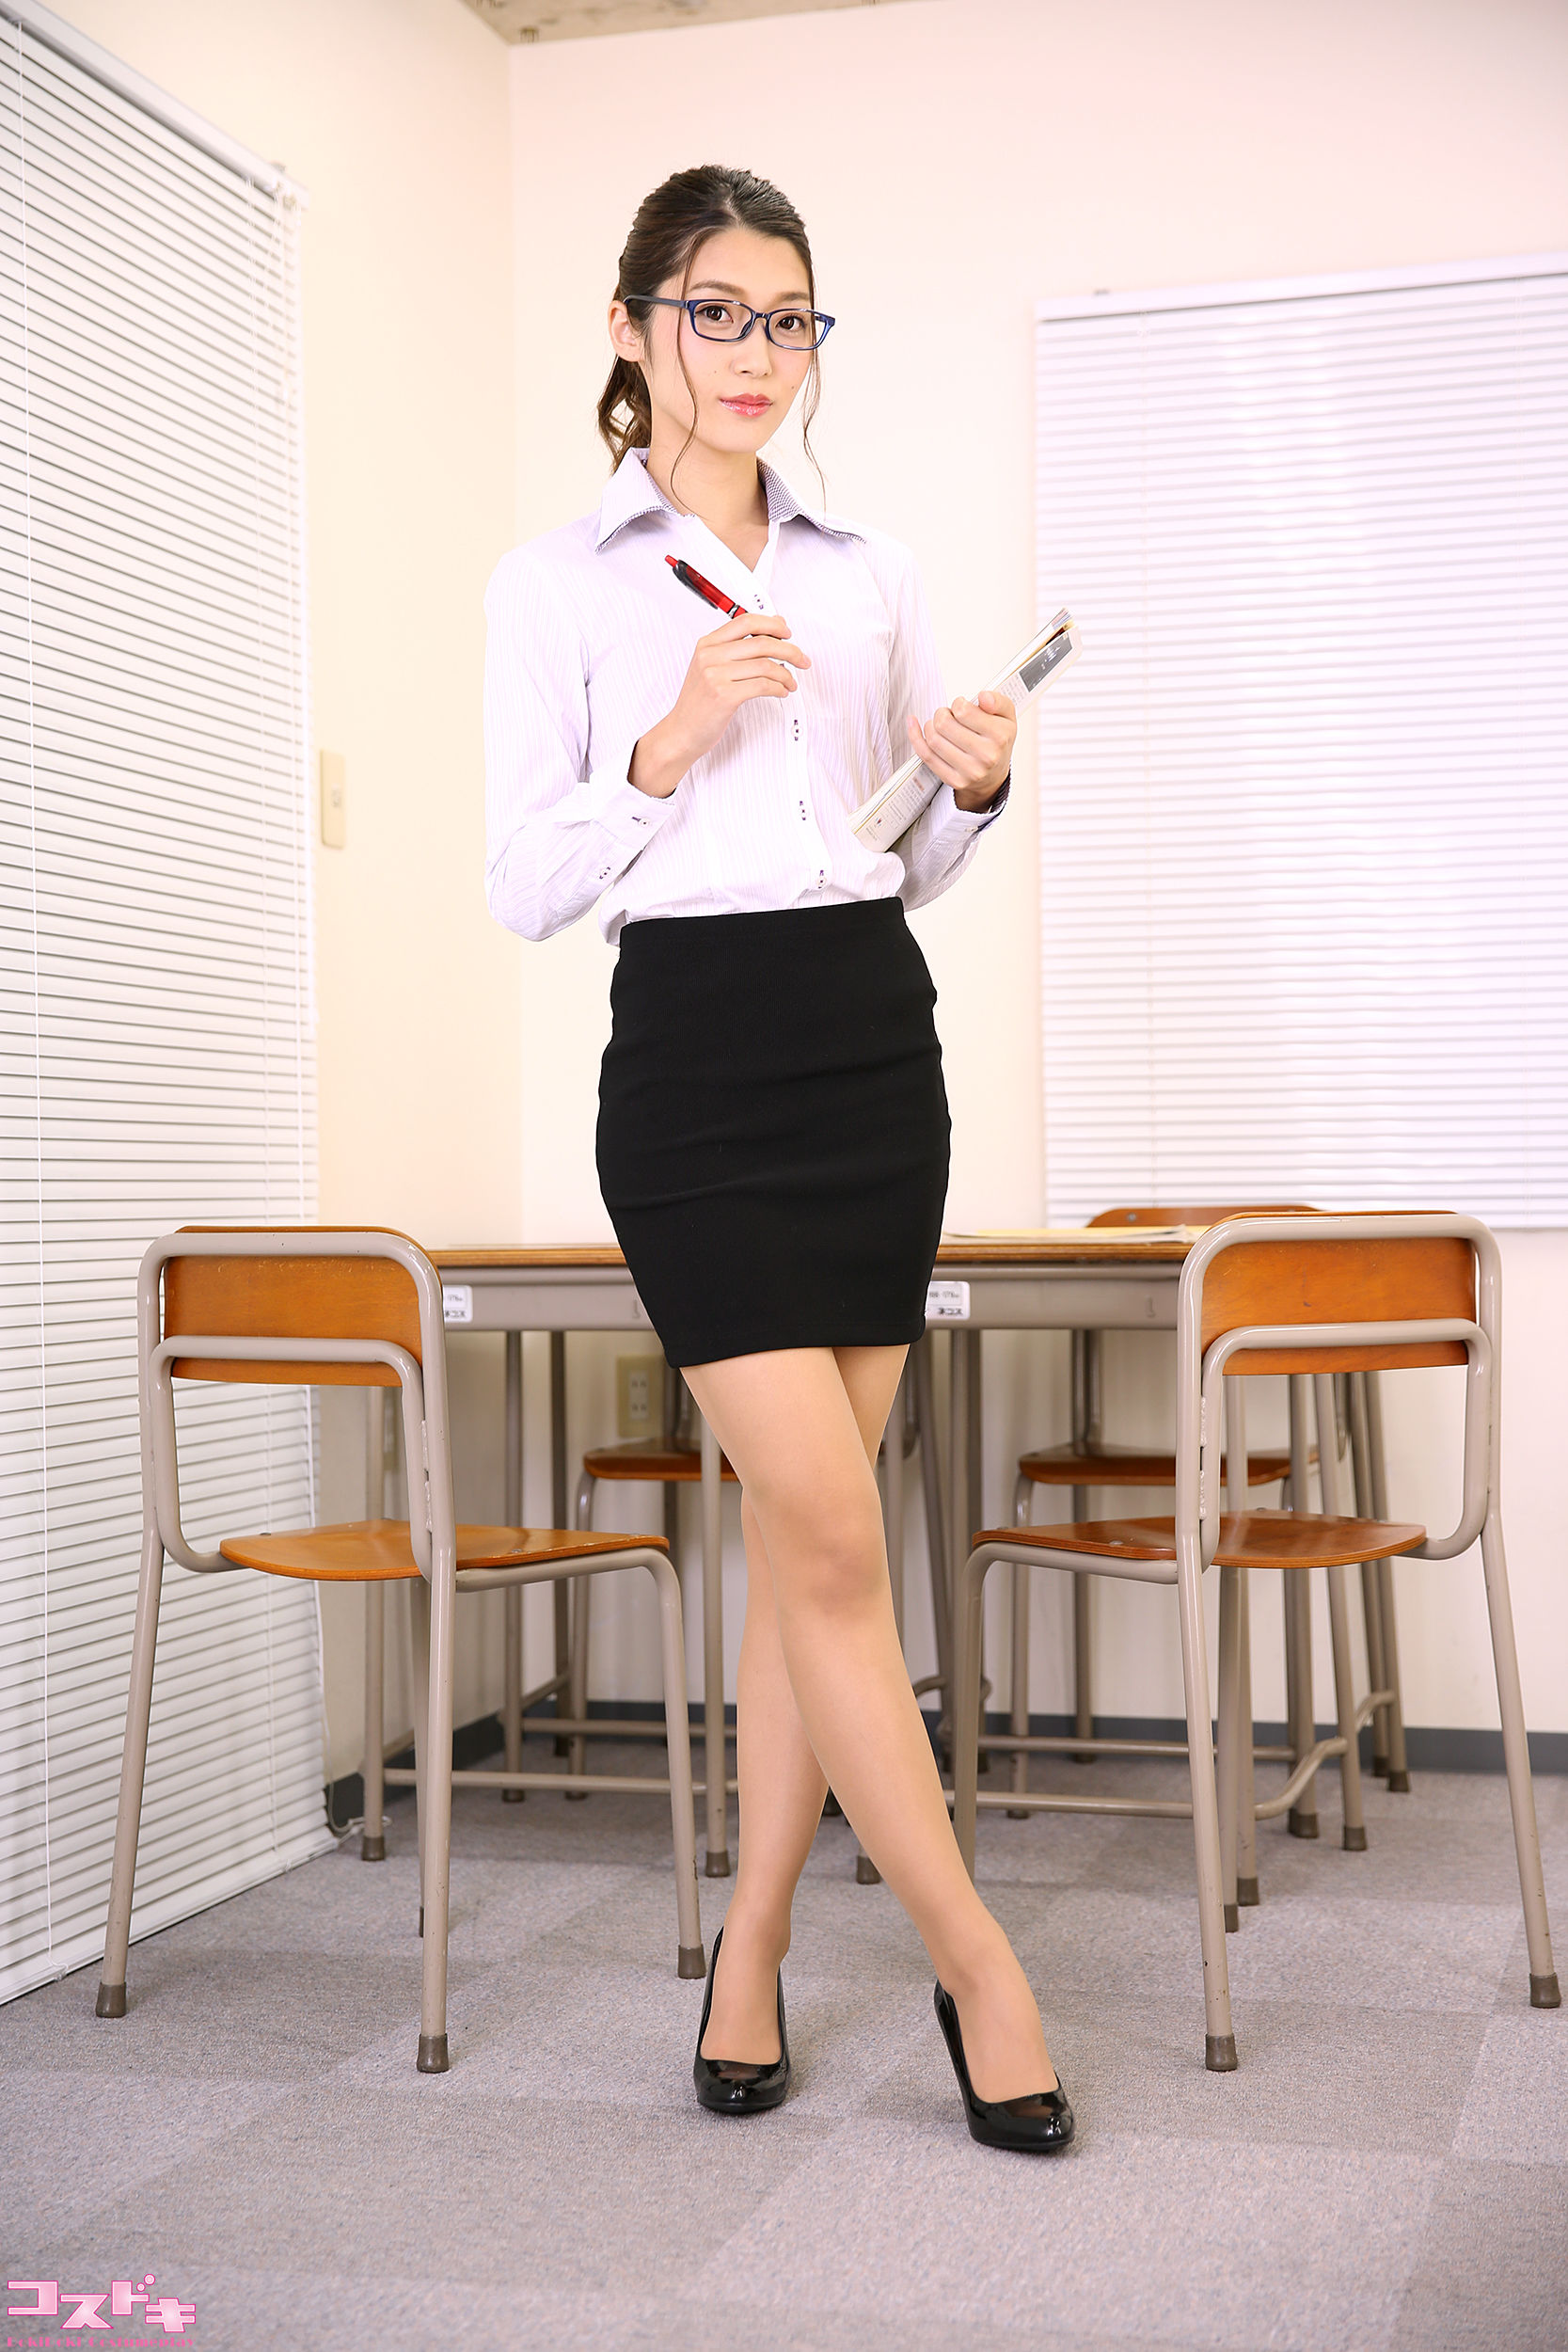 VOL.813 [Cosdoki]丝袜诱惑老师:香苗玲音(香苗レノン)超高清写真套图(47P)